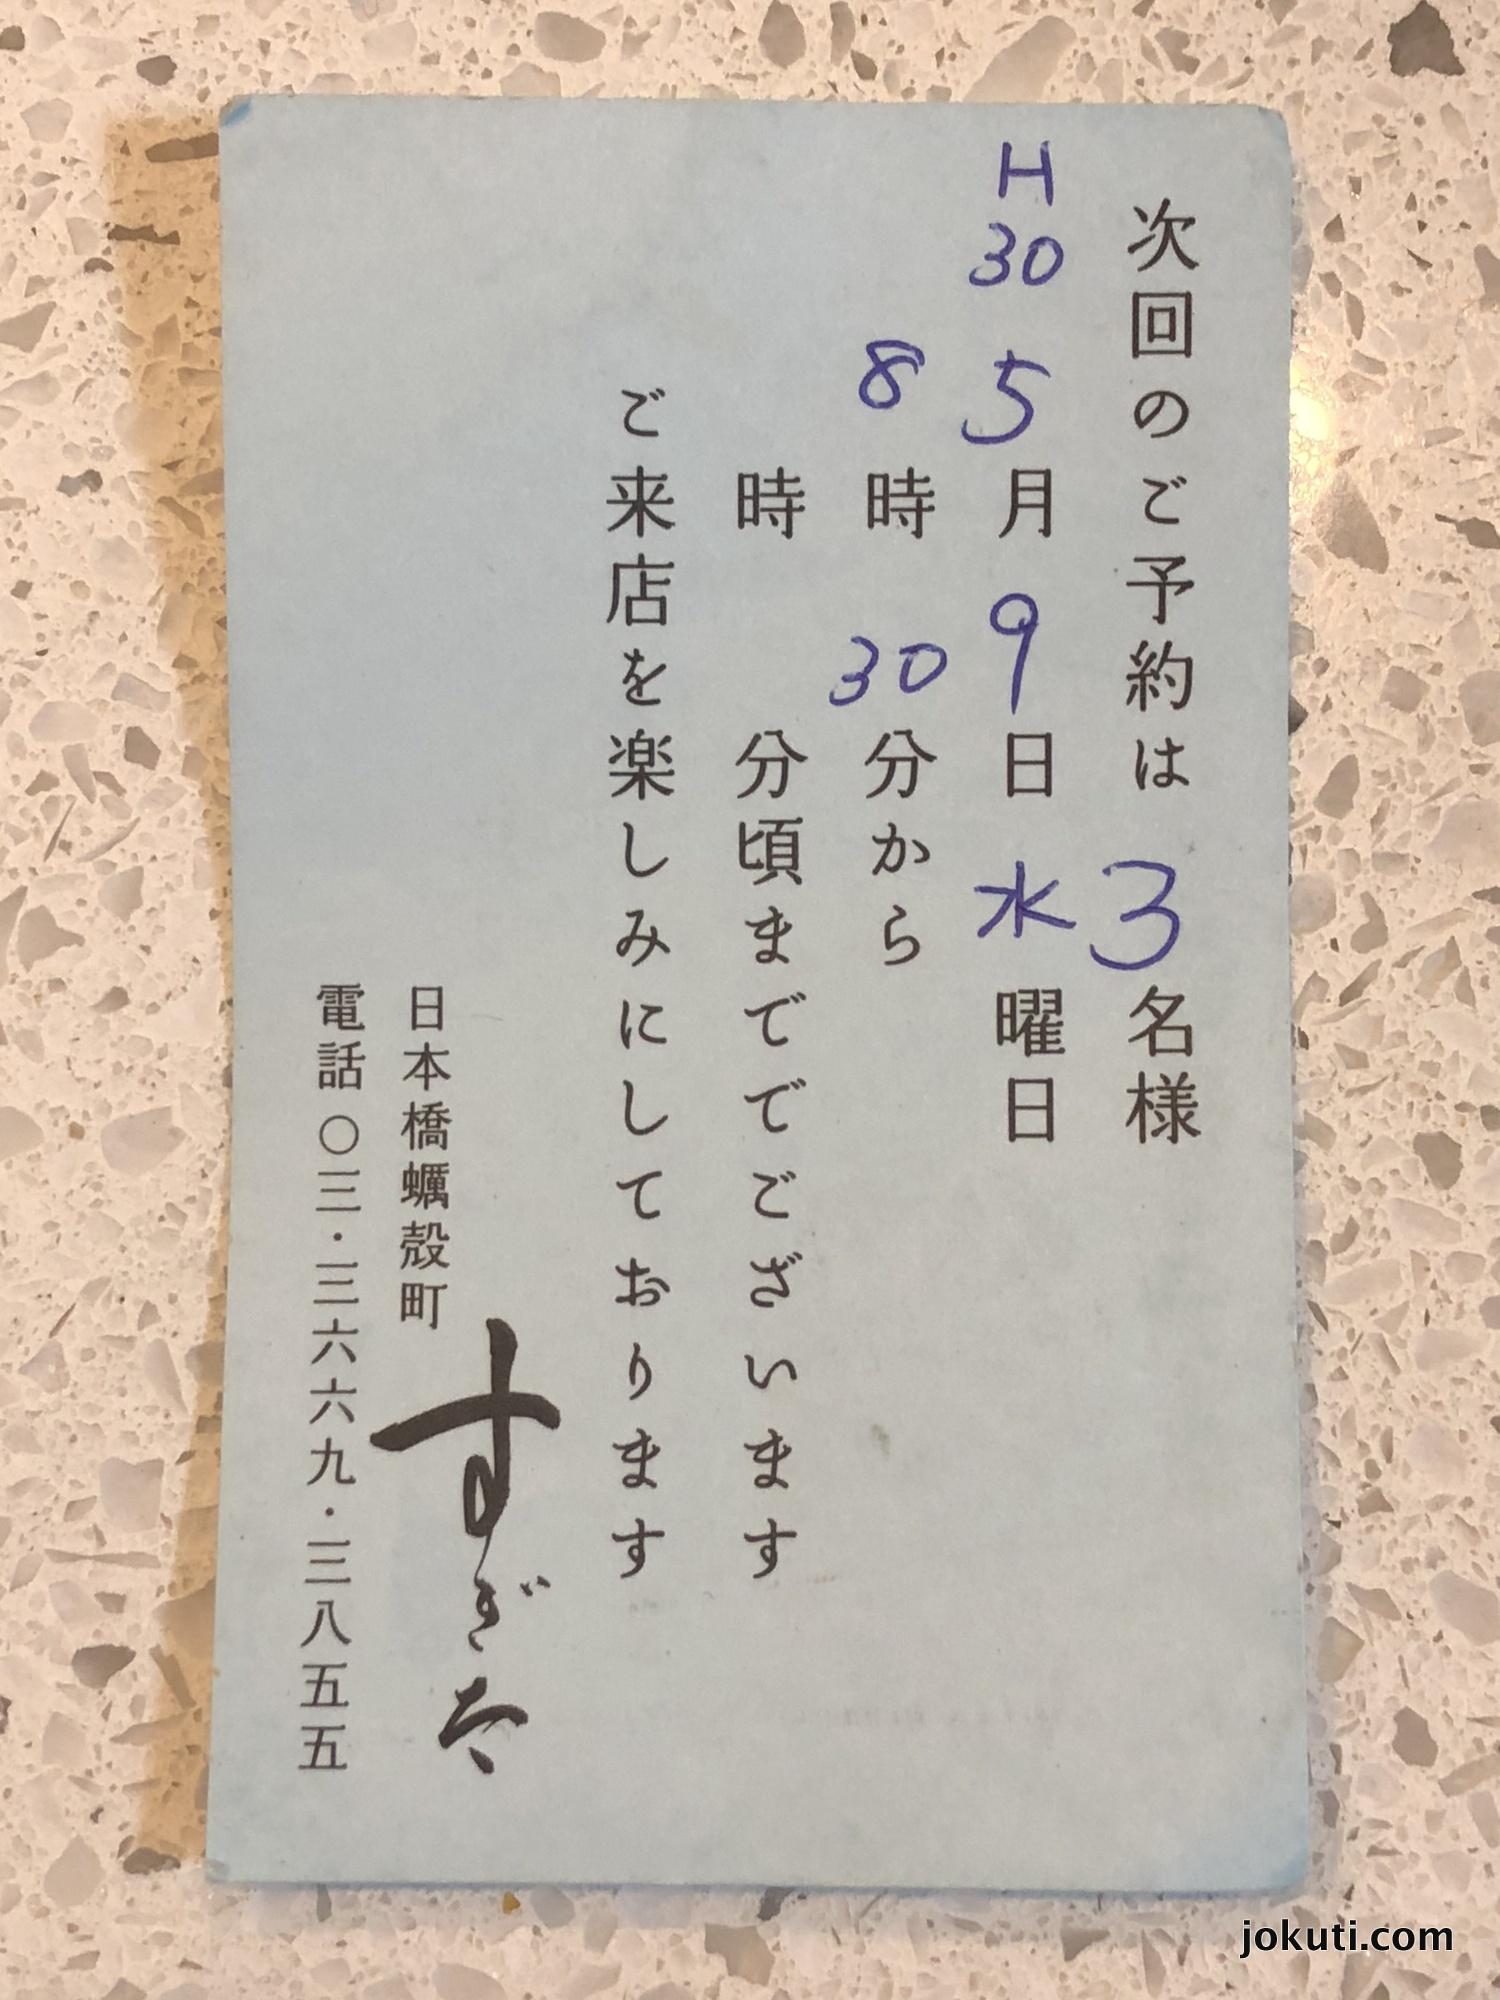 img_3293_sugita_sushi_michelin_tokyo_japan_vilagevo_jokuti.jpg